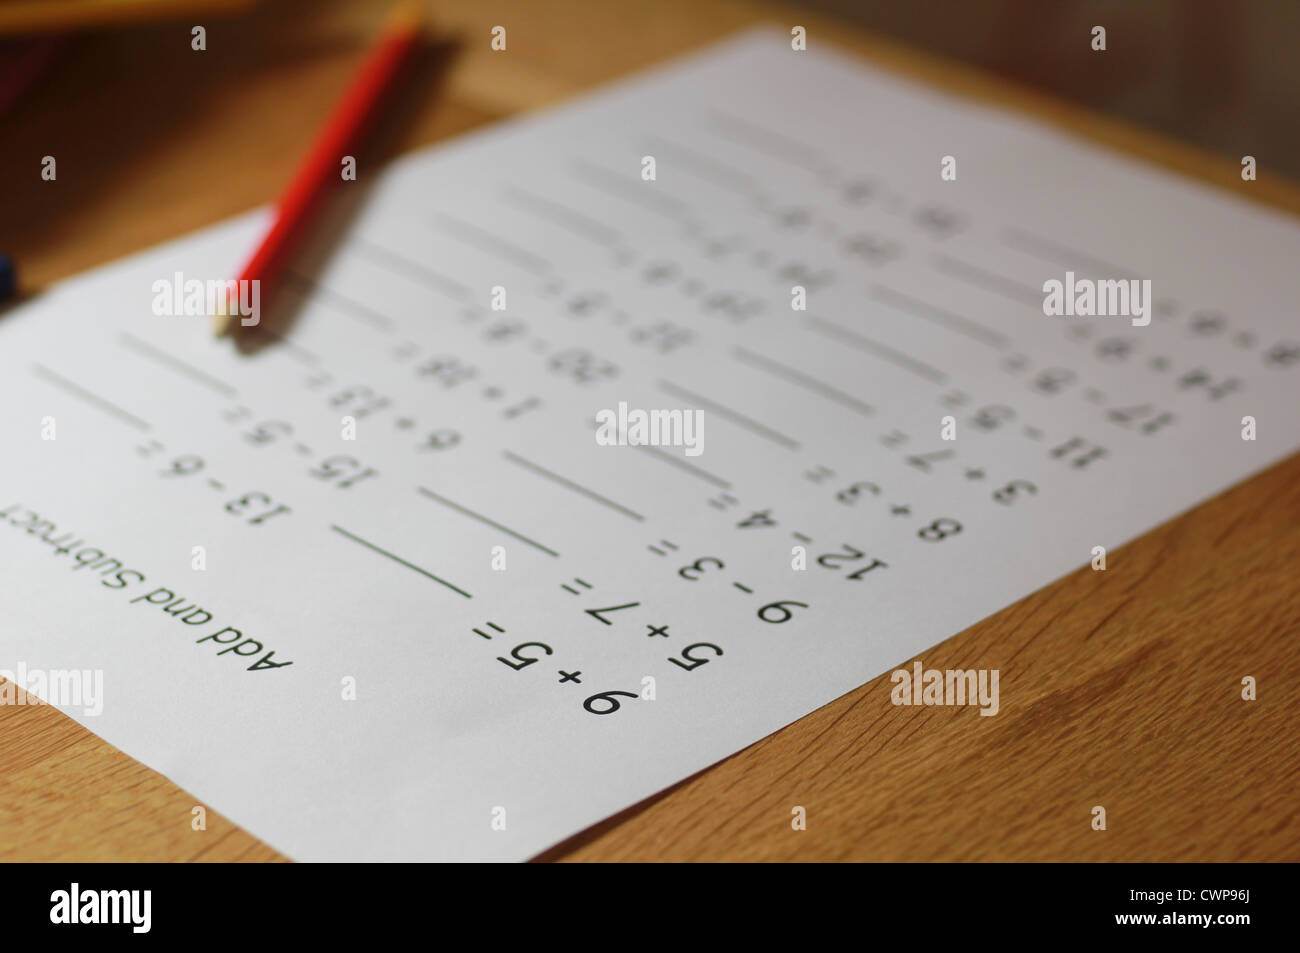 Mathe-Hausaufgaben Stockfoto, Bild: 50277322 - Alamy